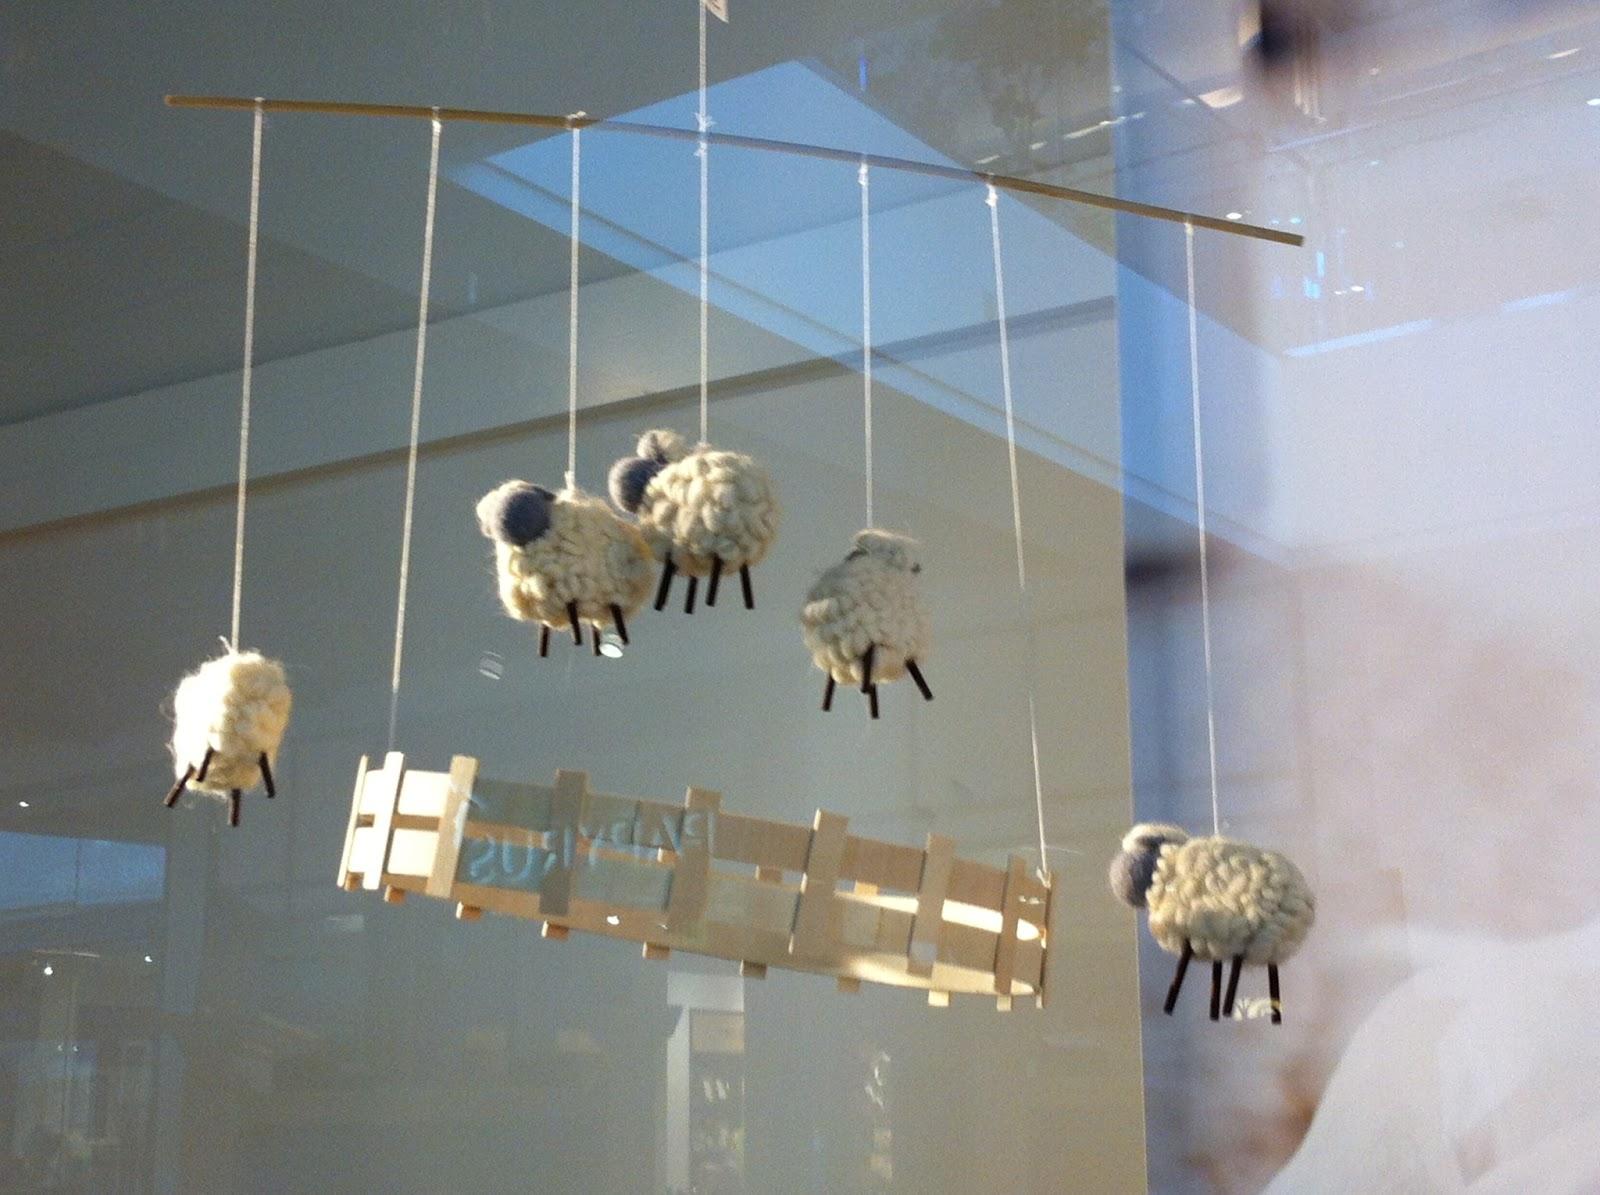 Amigurumi Sheep Baby Mobile : Life on laffer: fluffy little sheep